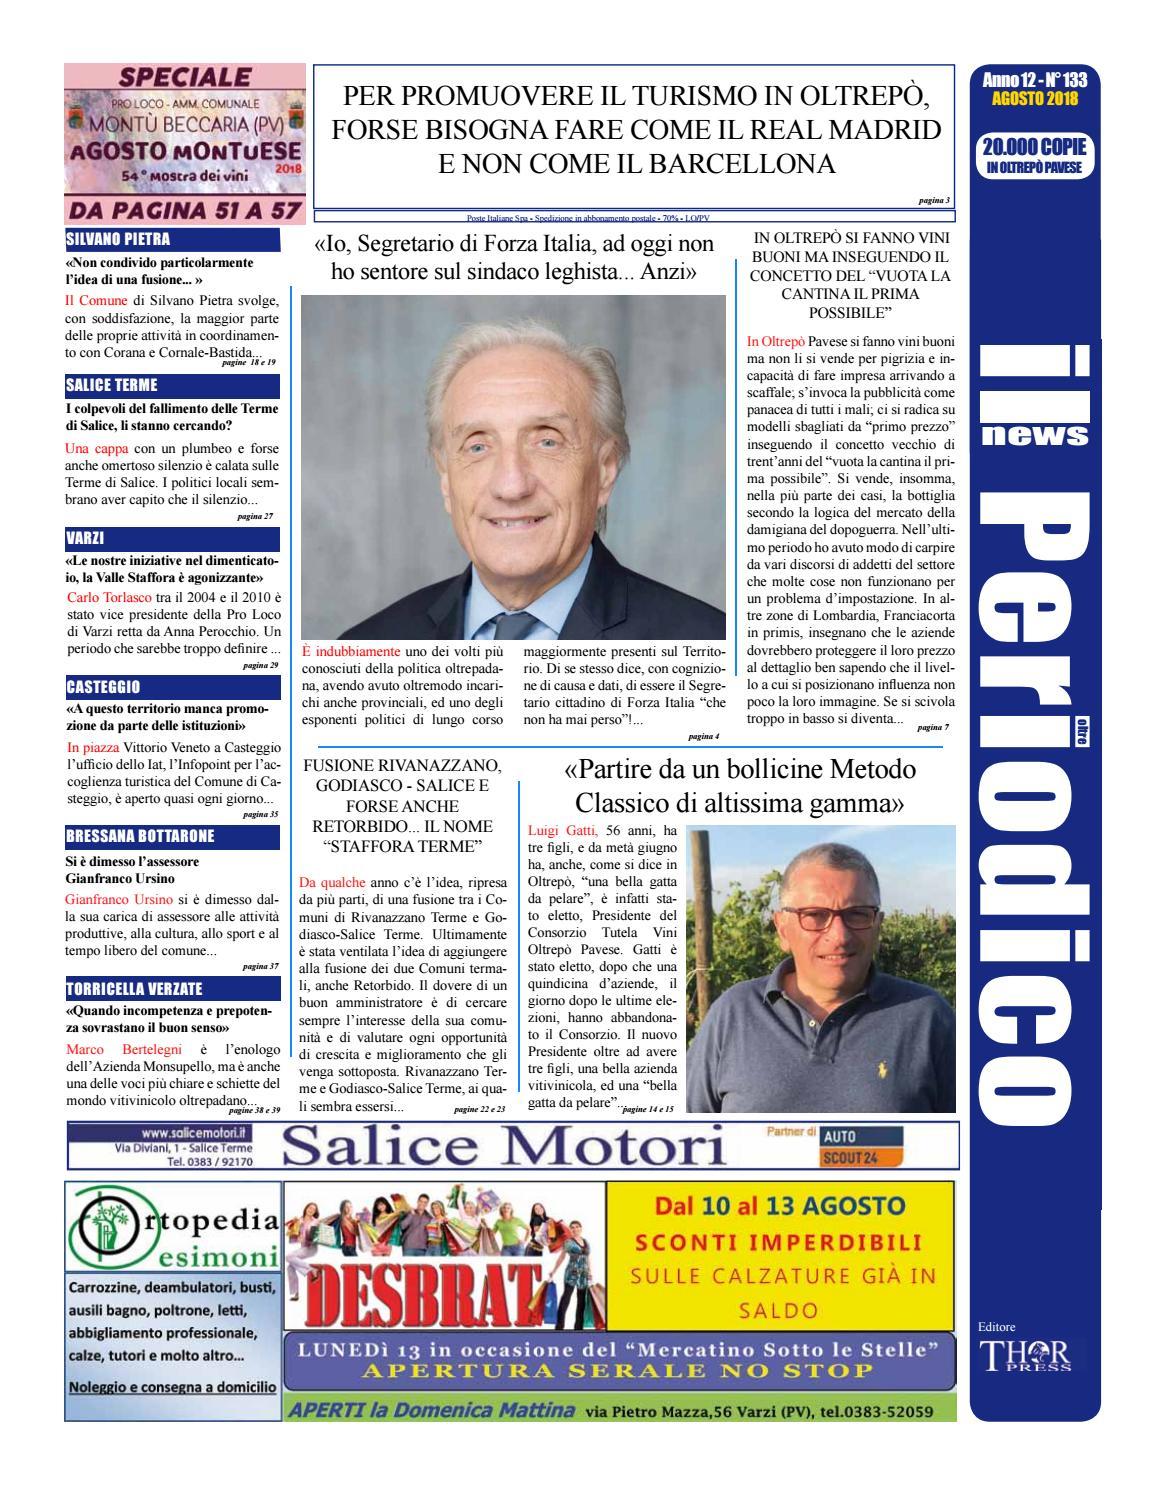 Il Periodico News - AGOSTO 2018 N°133 by IlPeriodicoNews - issuu d5b62136d45